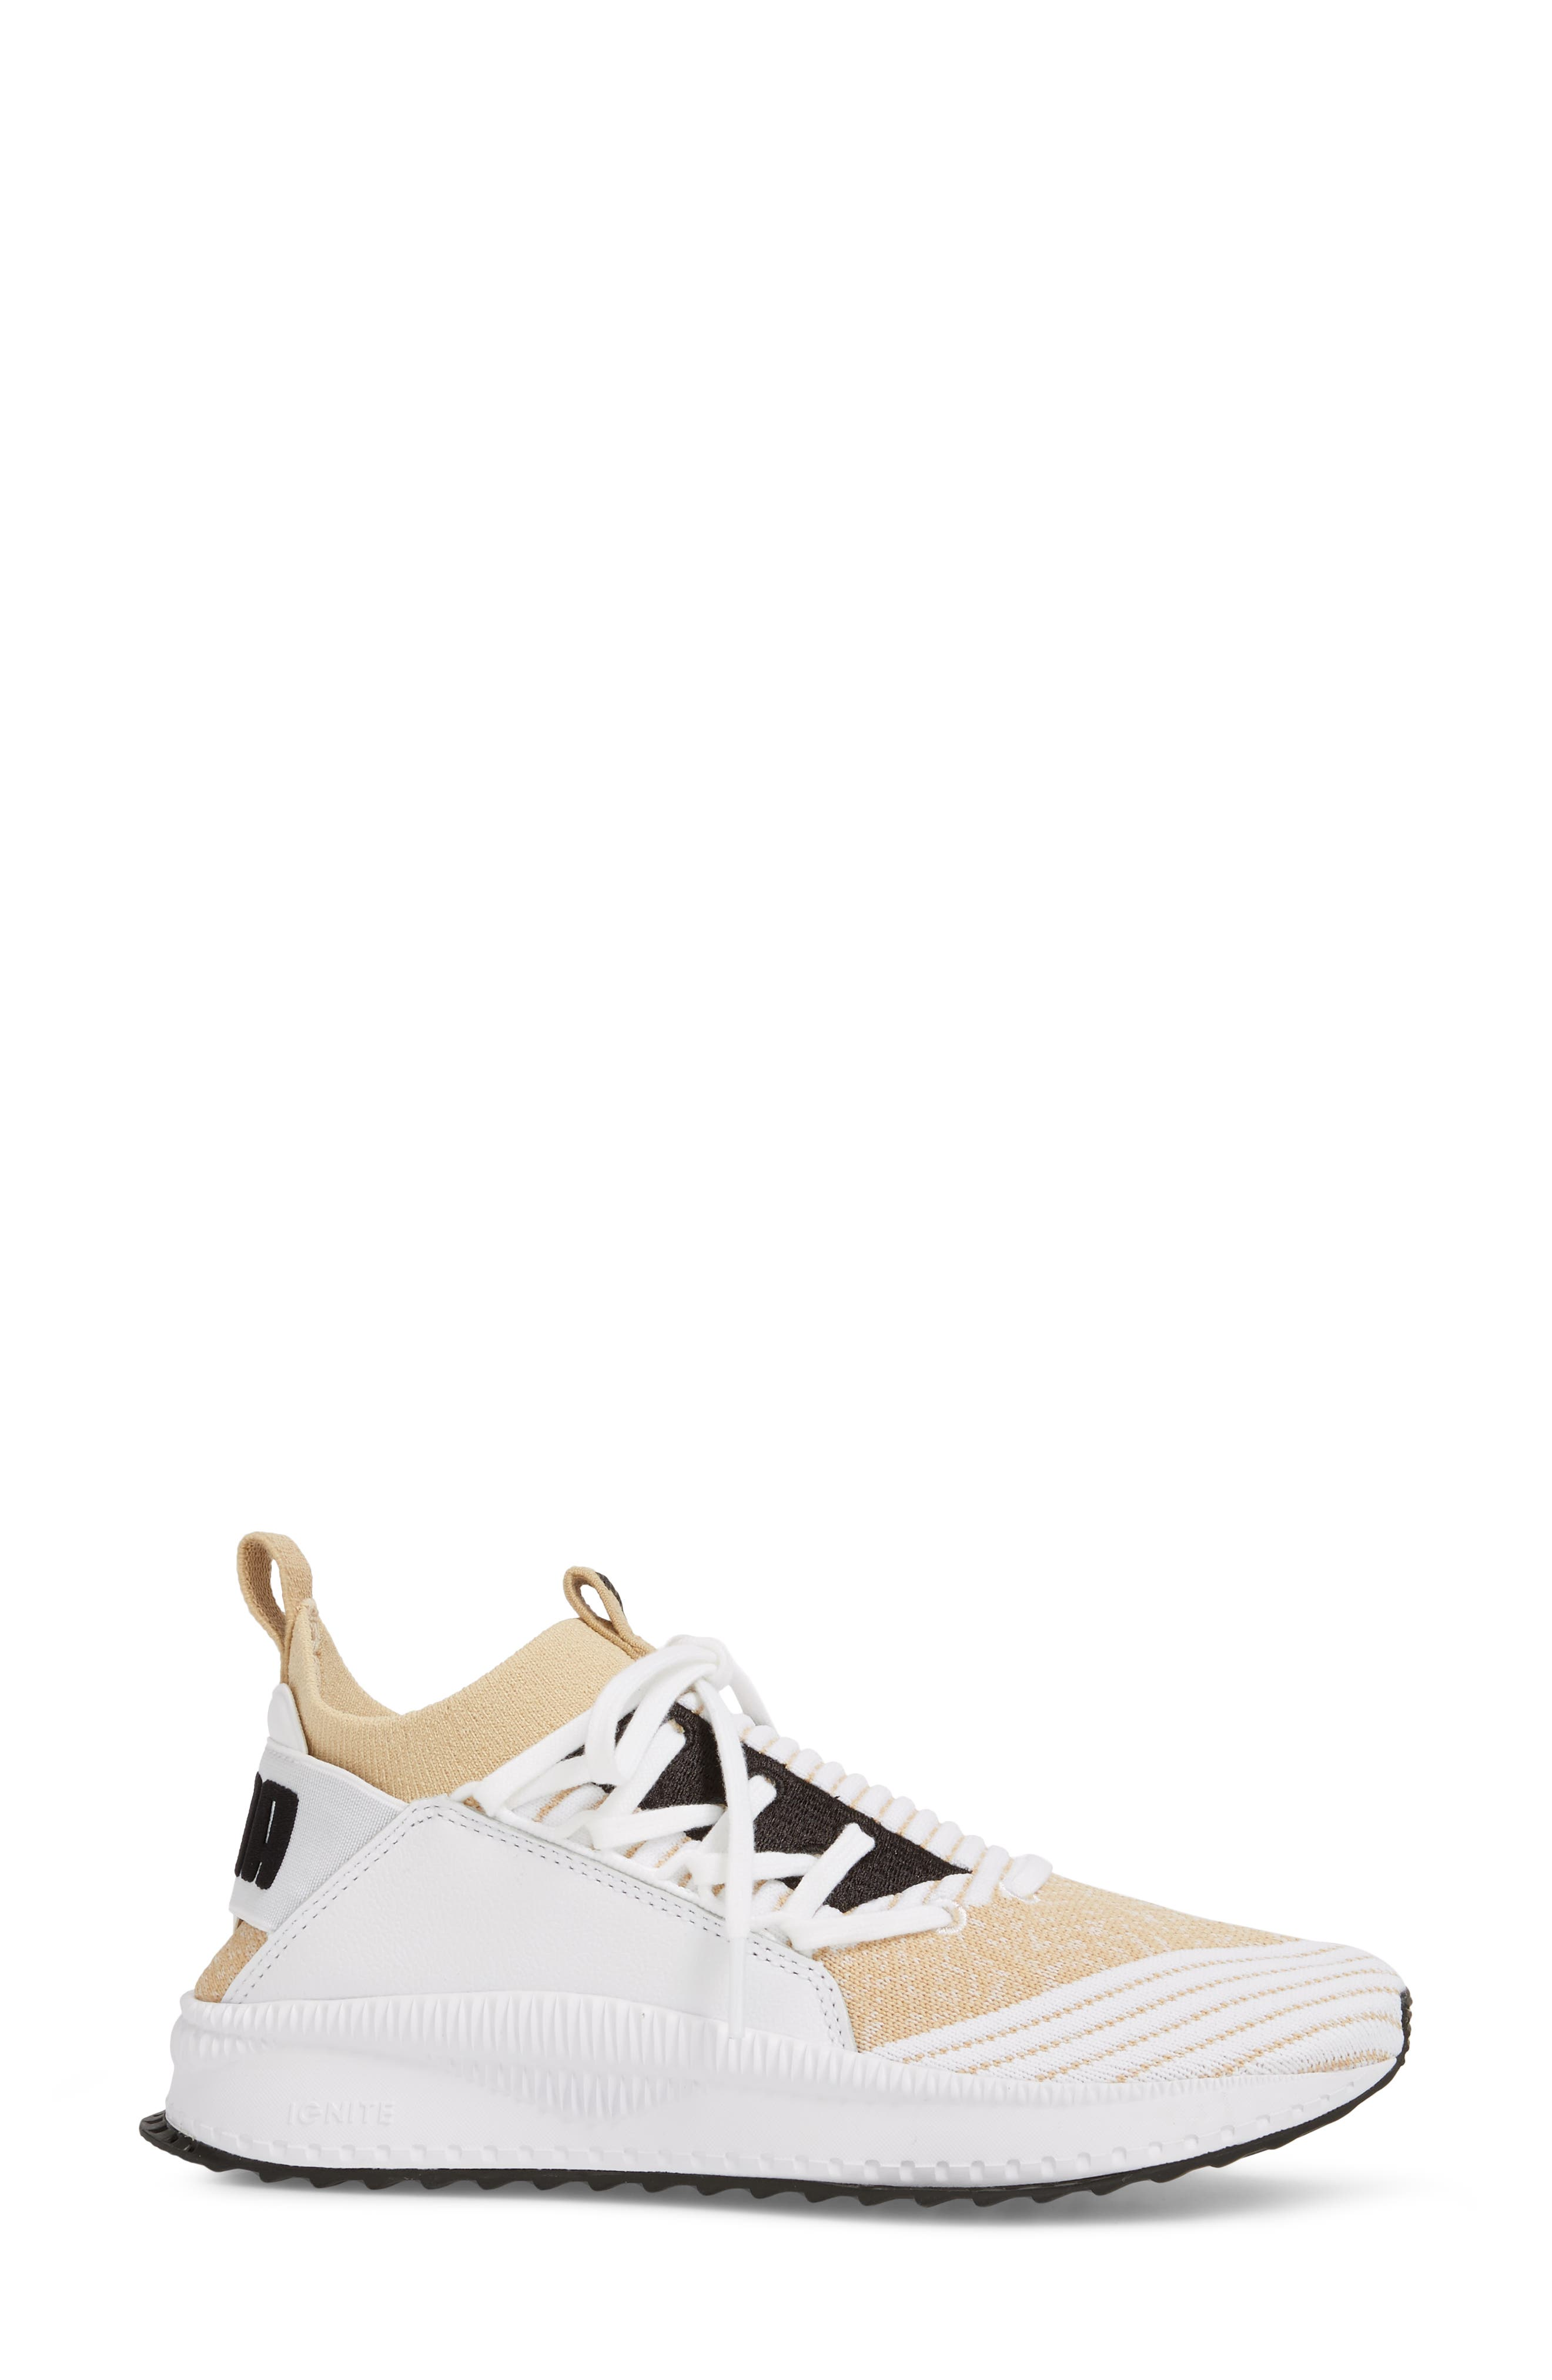 Tsugi Jun Knit Sneaker,                             Alternate thumbnail 18, color,